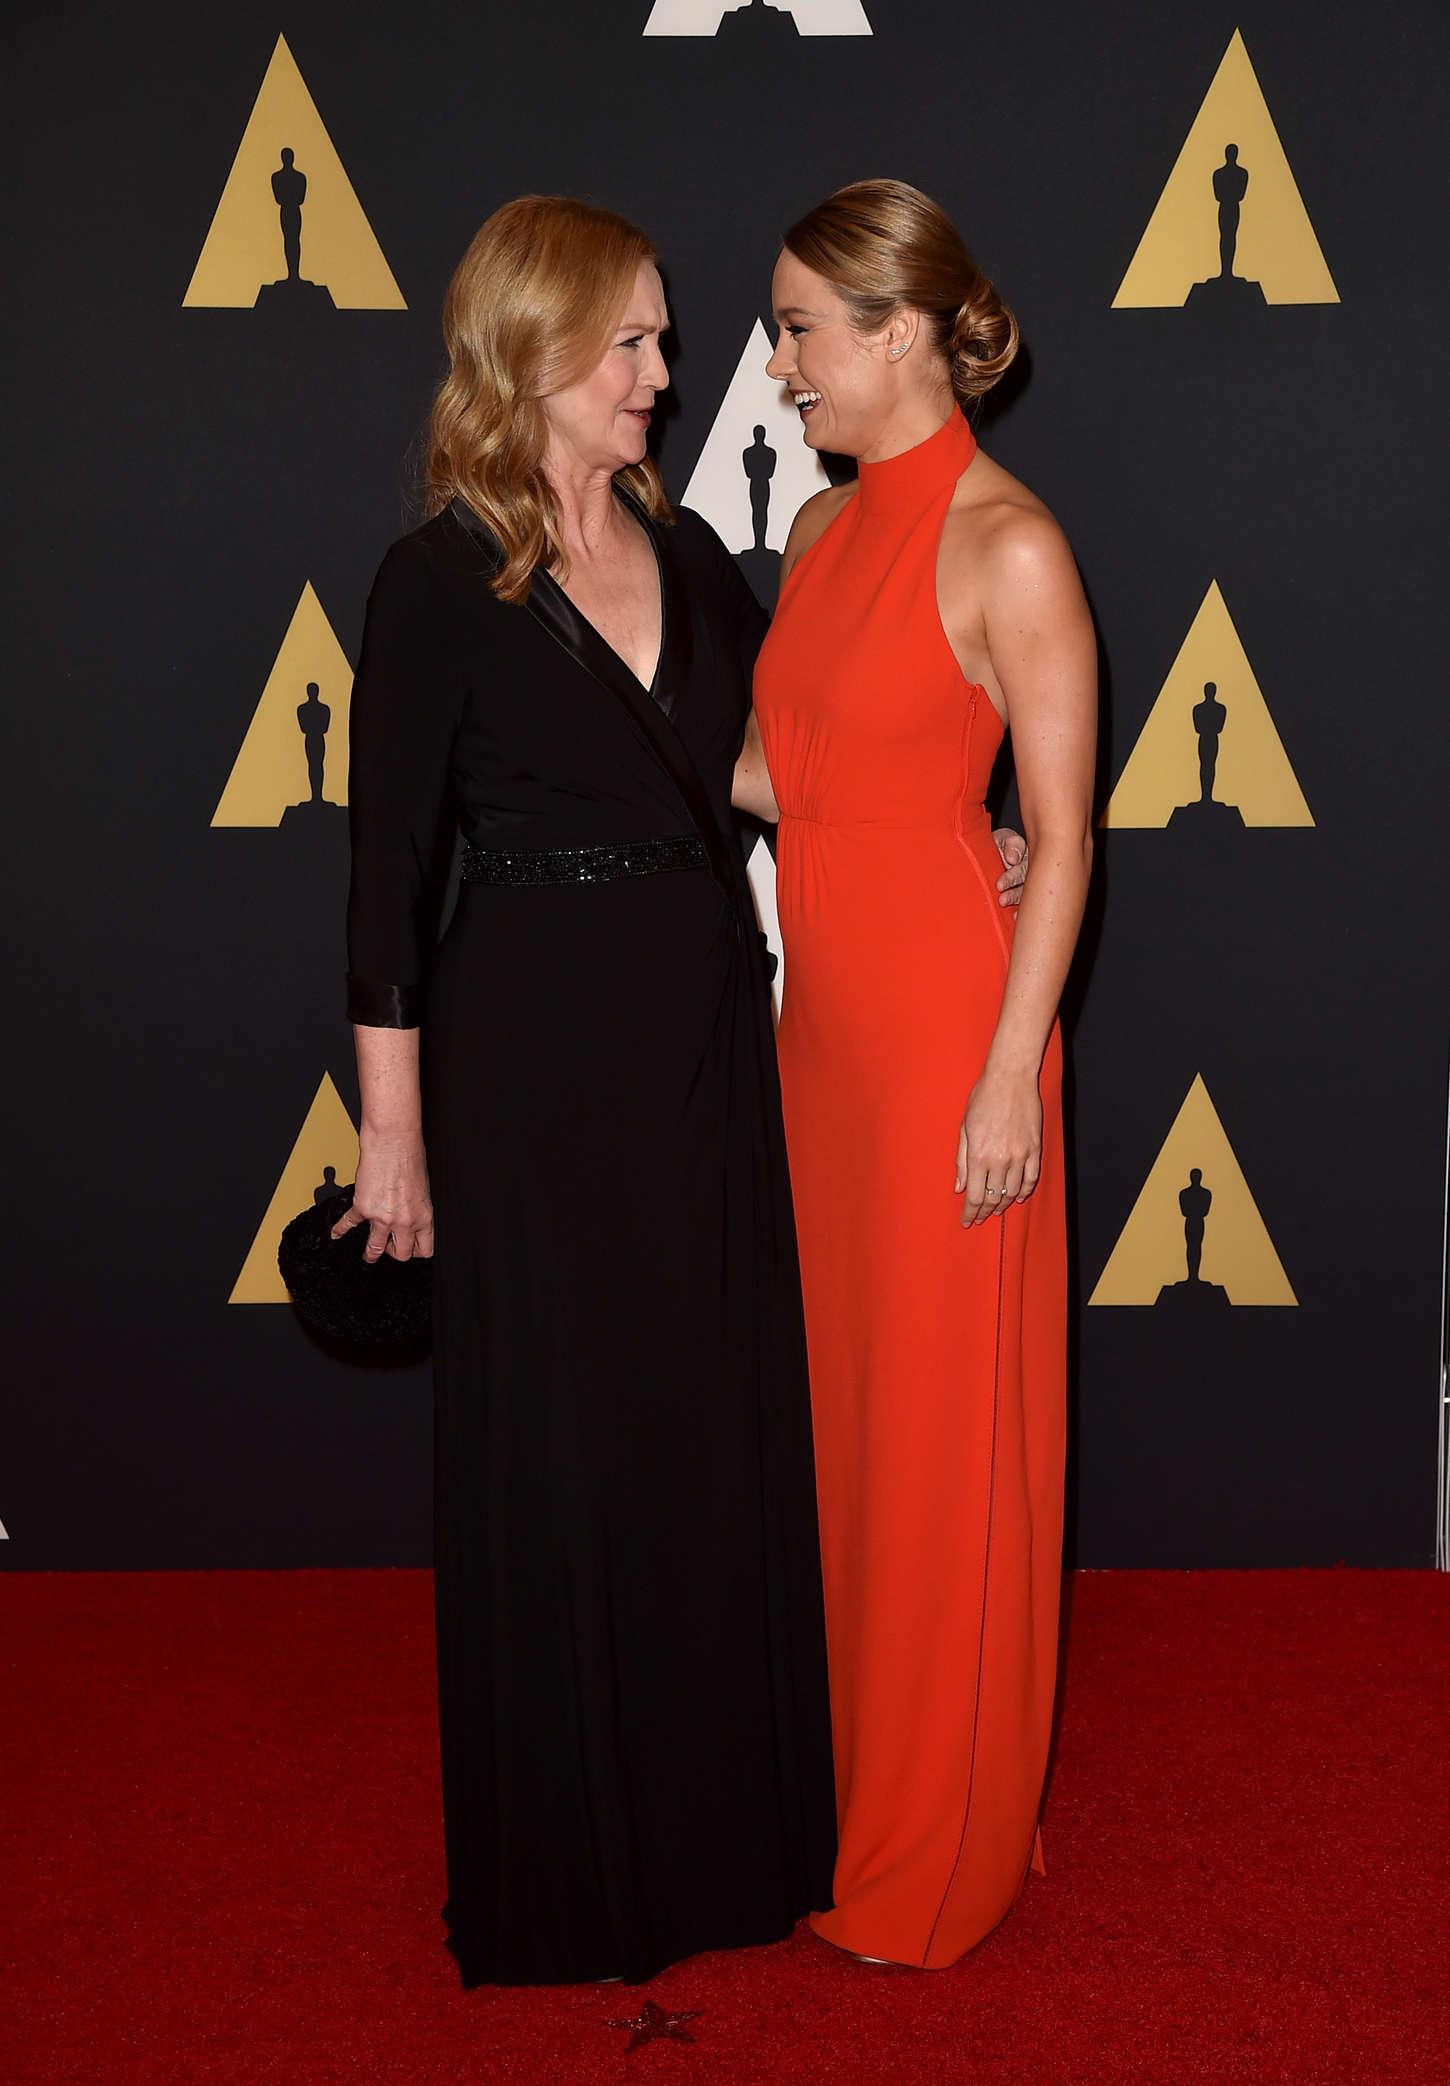 Brie Larson 2015 : Brie Larson: Governors Awards 2015 -06